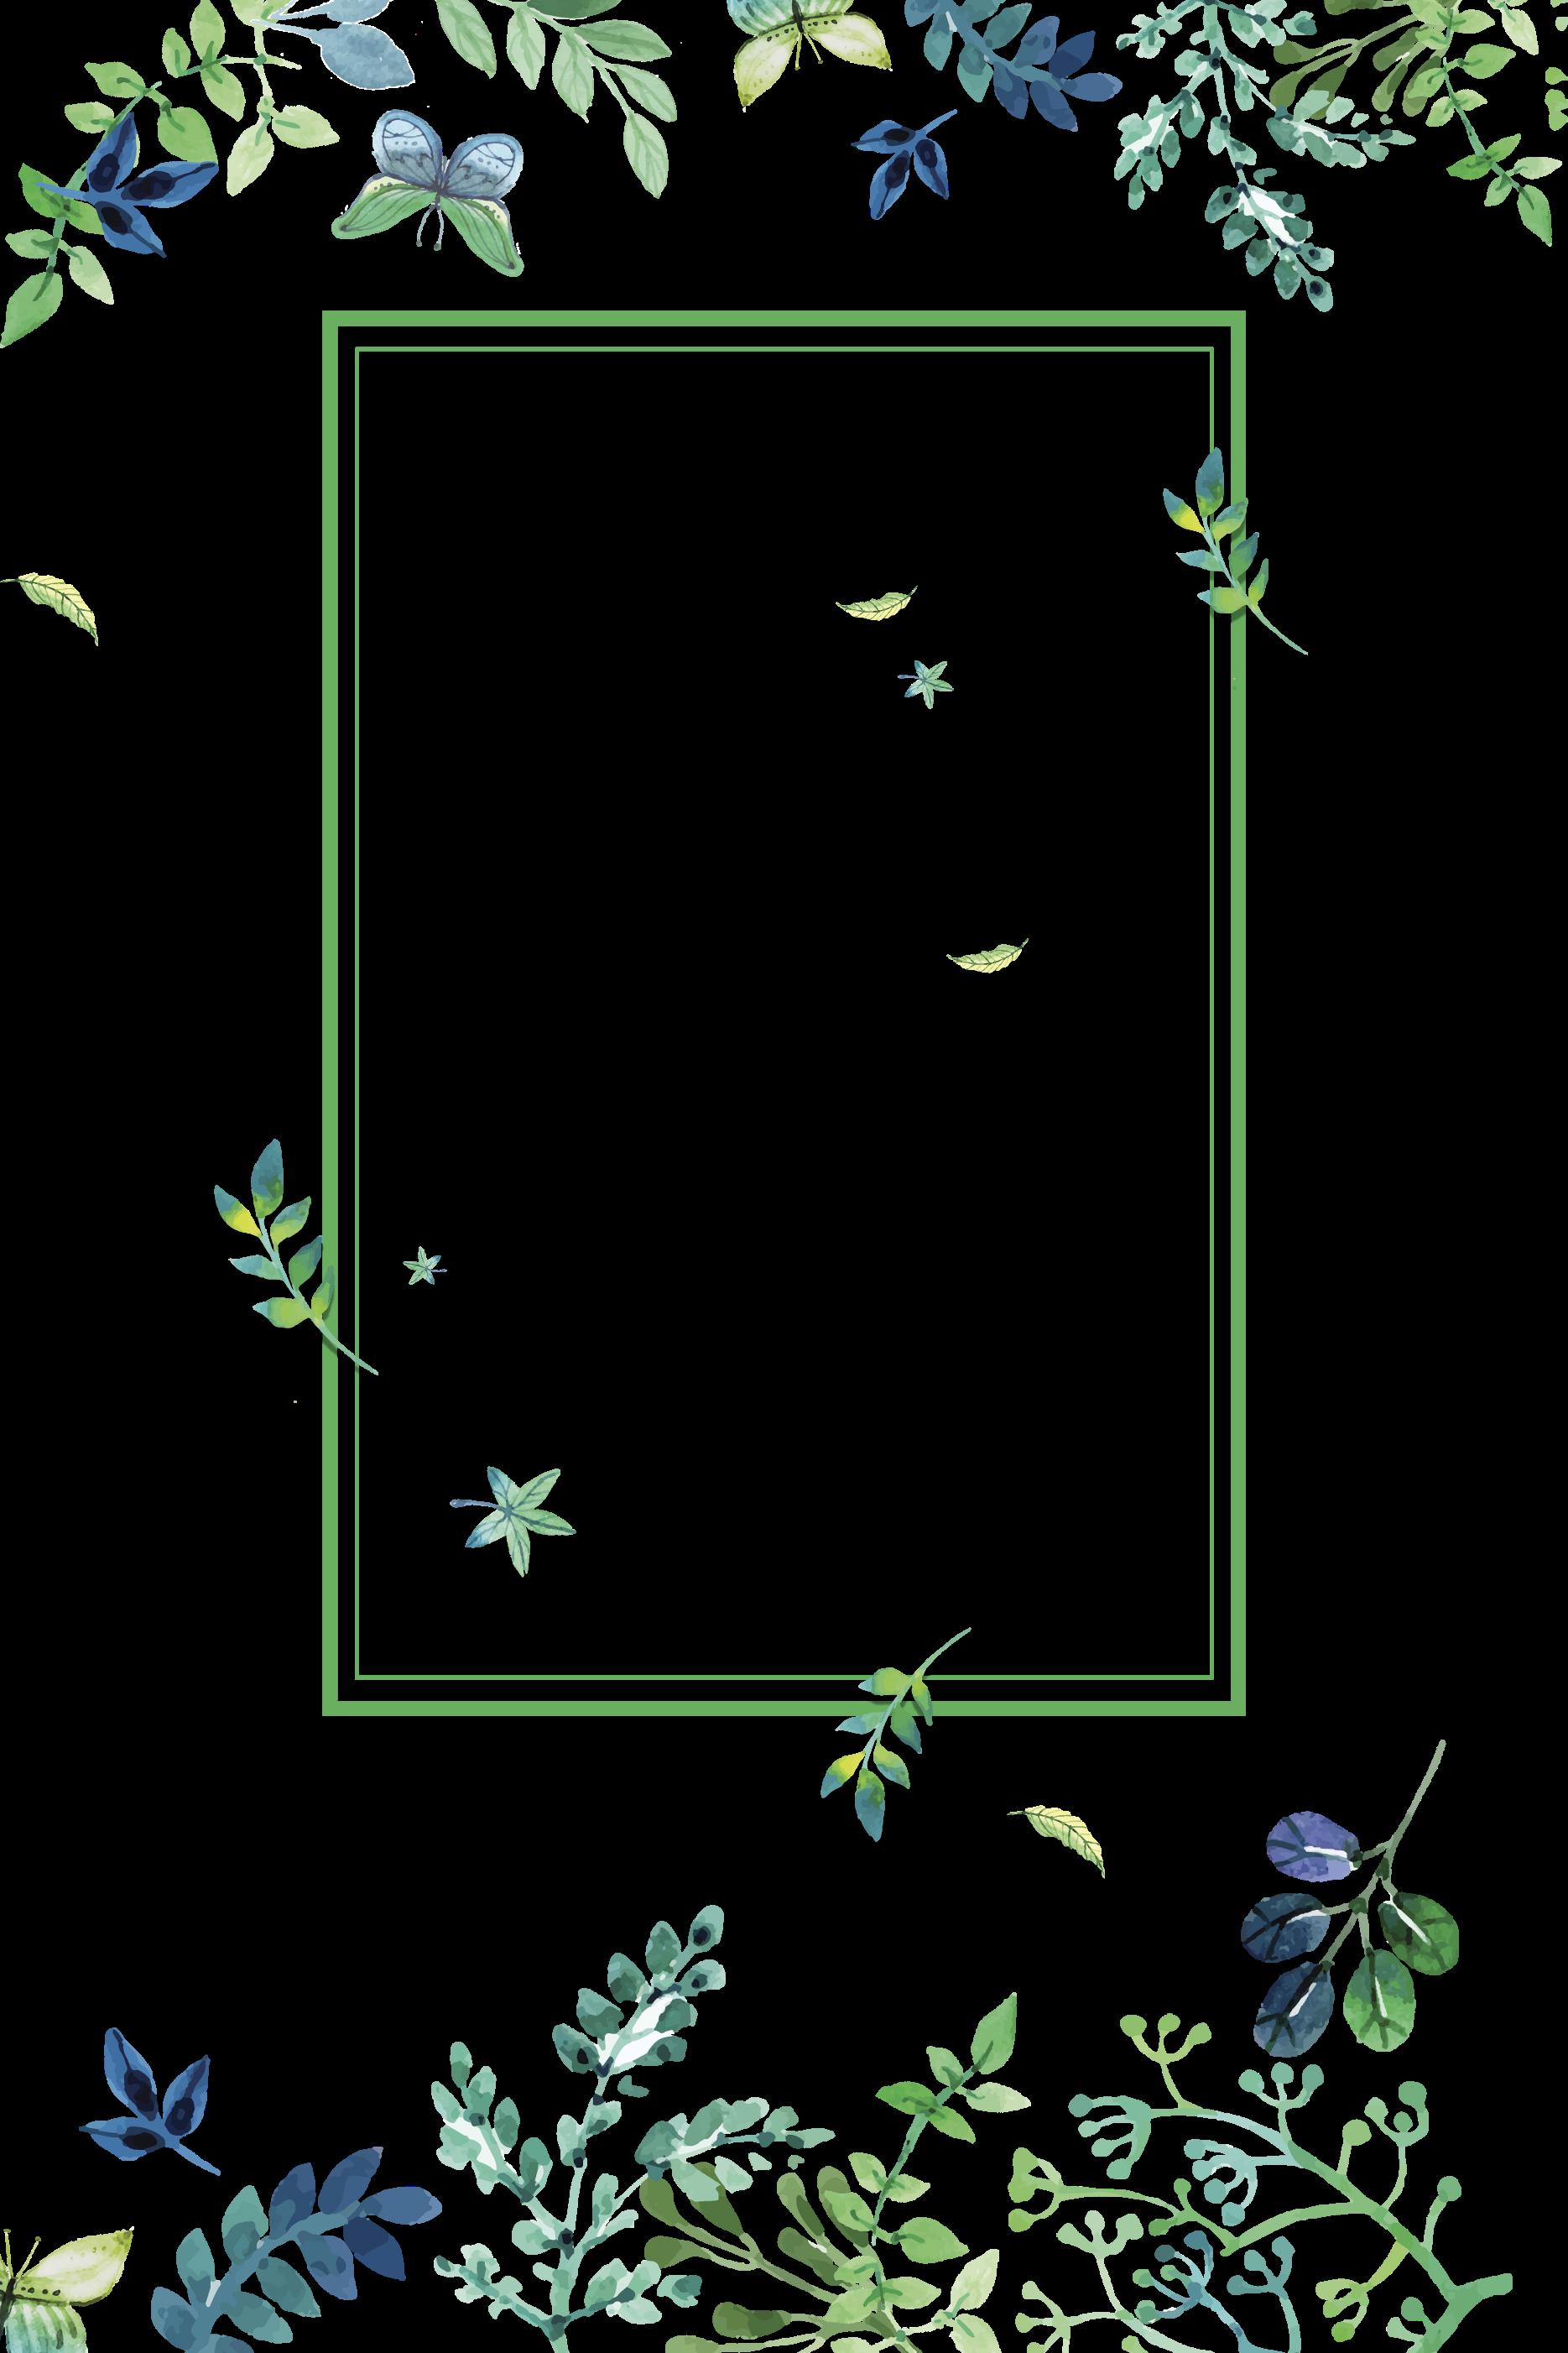 Flores Wallpaper Iphone Wallpaper Wallpaper Backgrounds Green